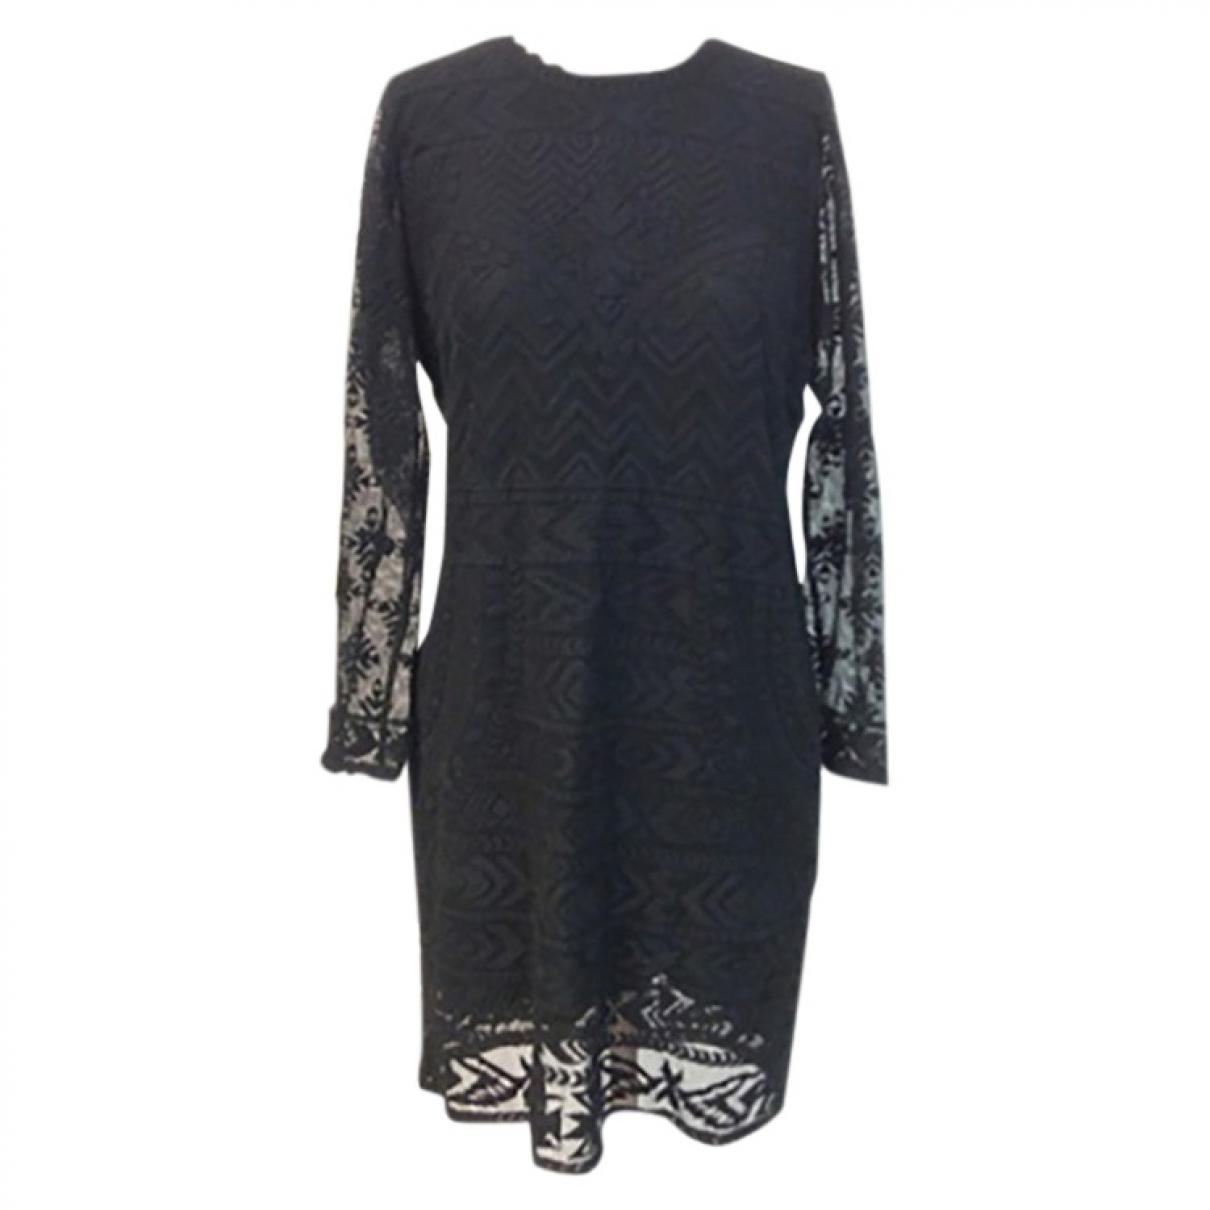 Isabel Marant Pour H&m \N Kleid in  Schwarz Synthetik